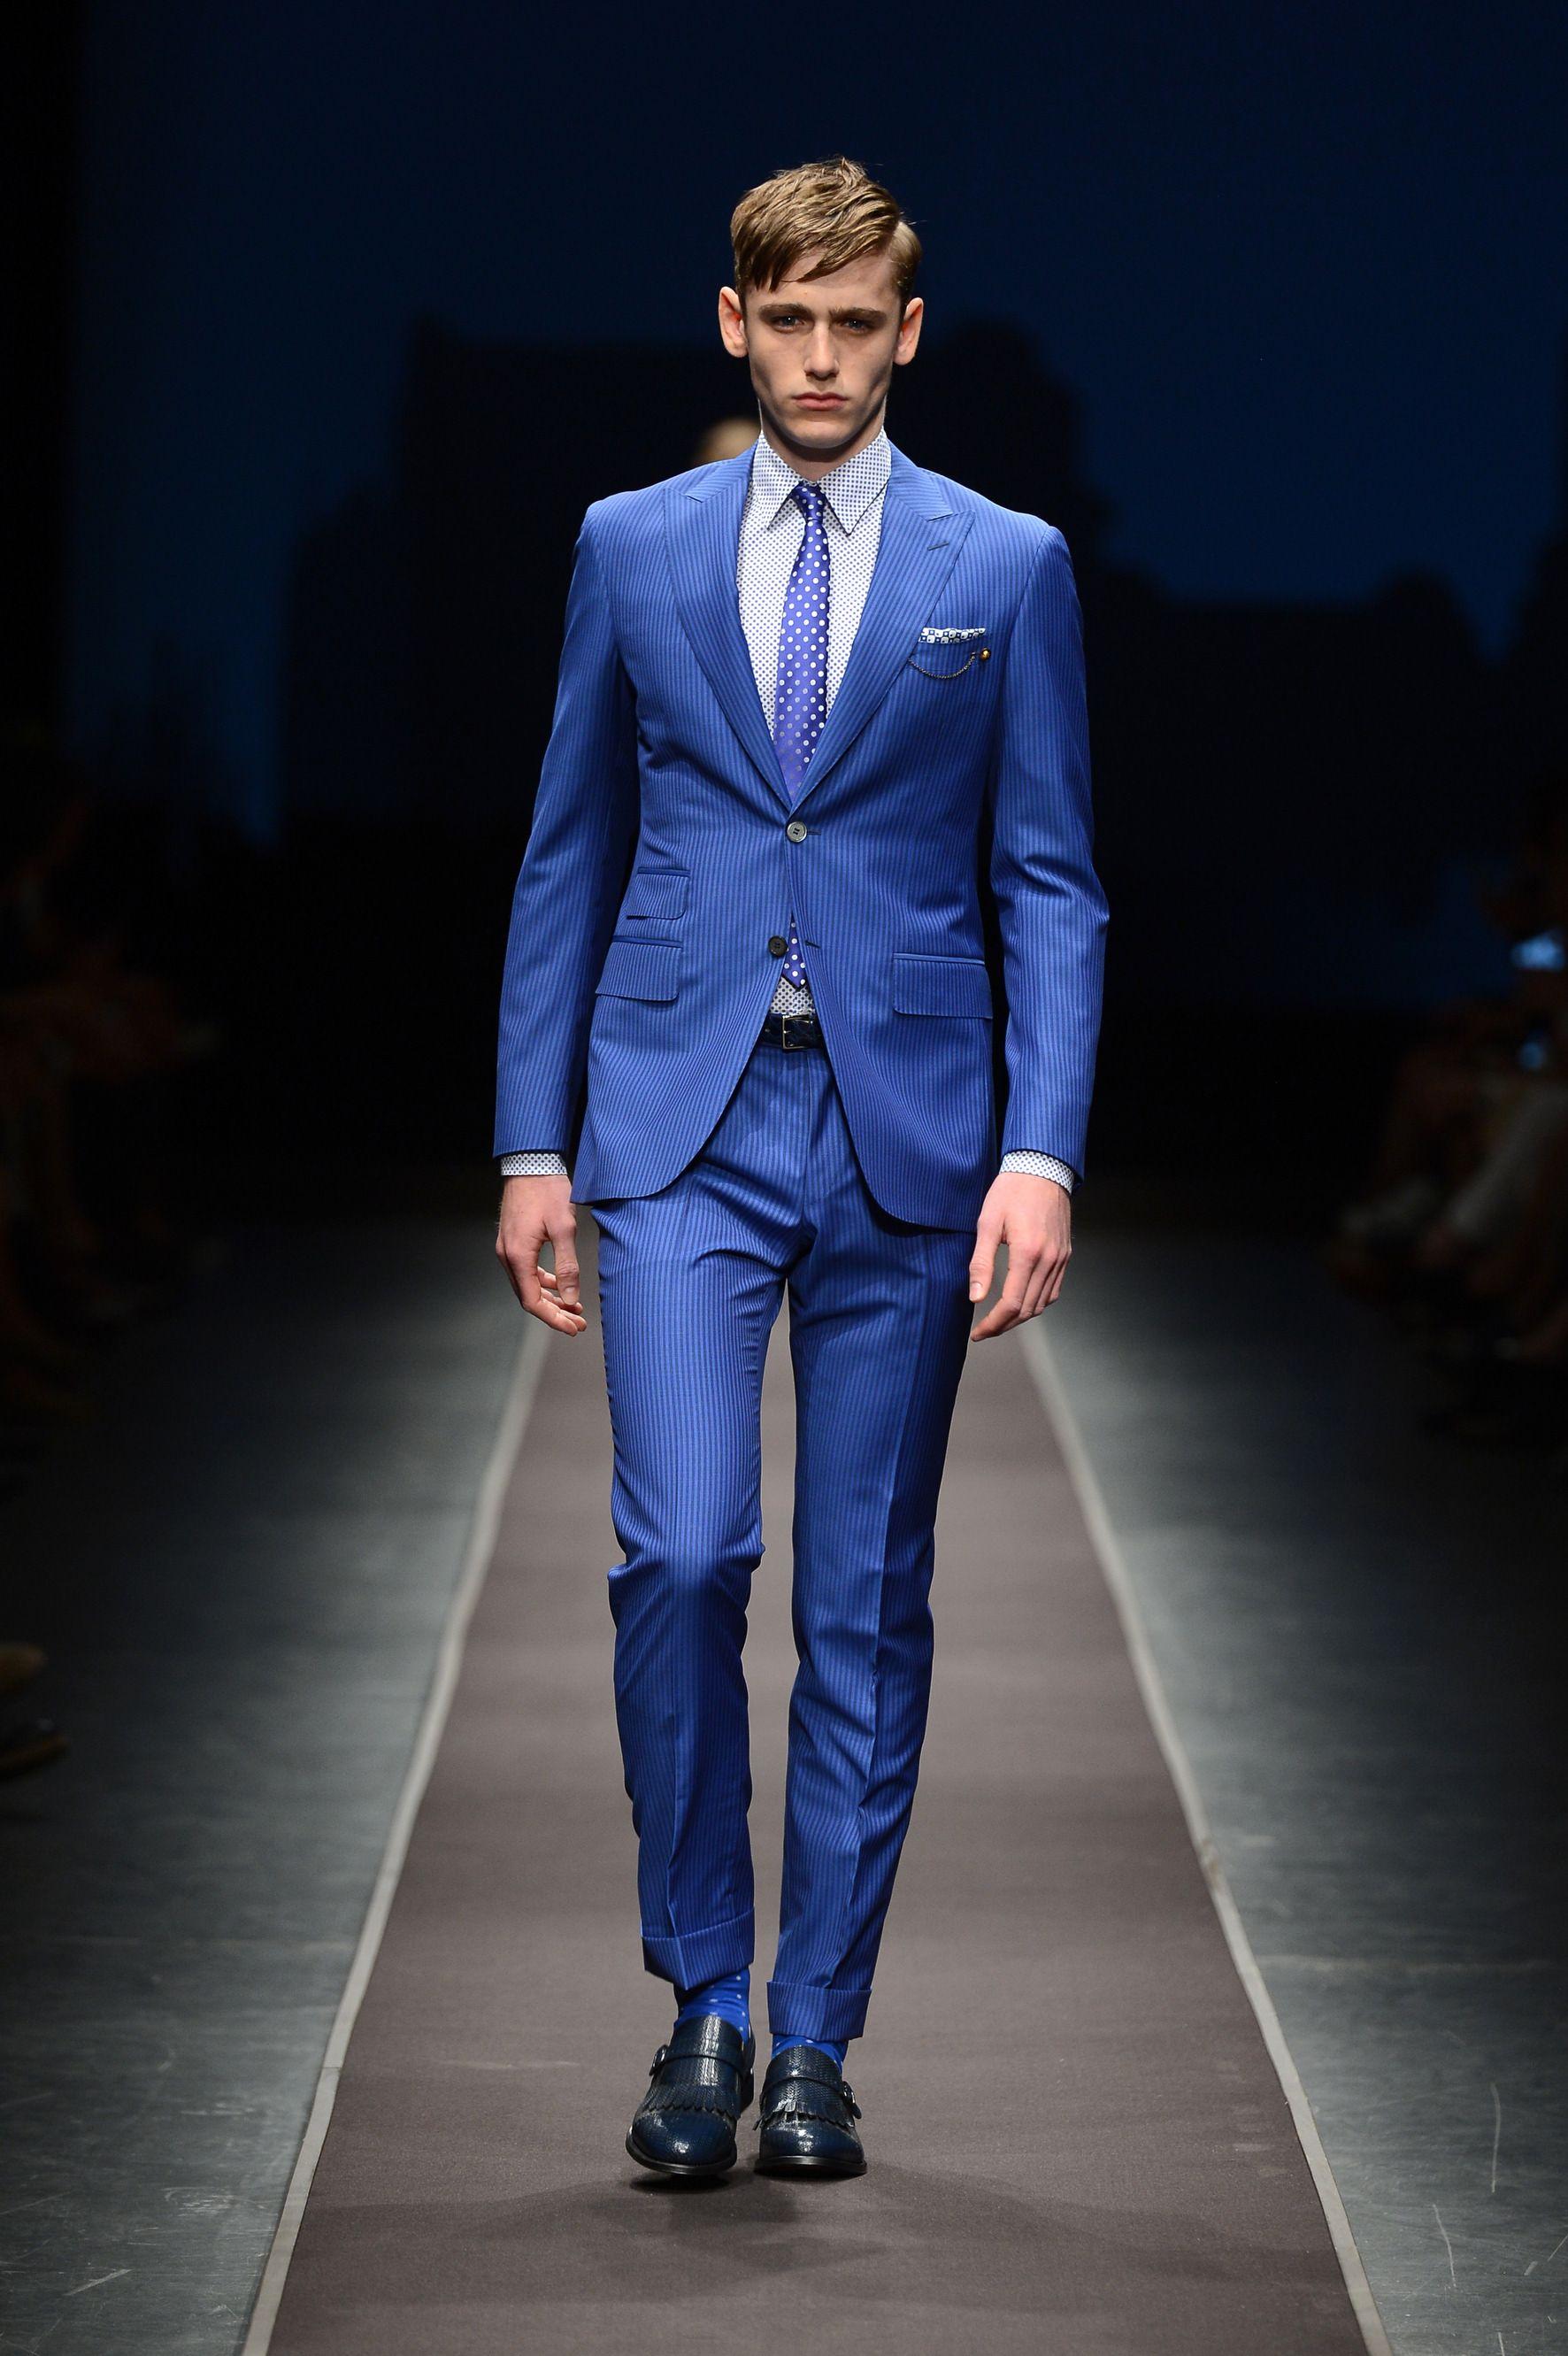 Canali Menswear SS14 Show, Milan